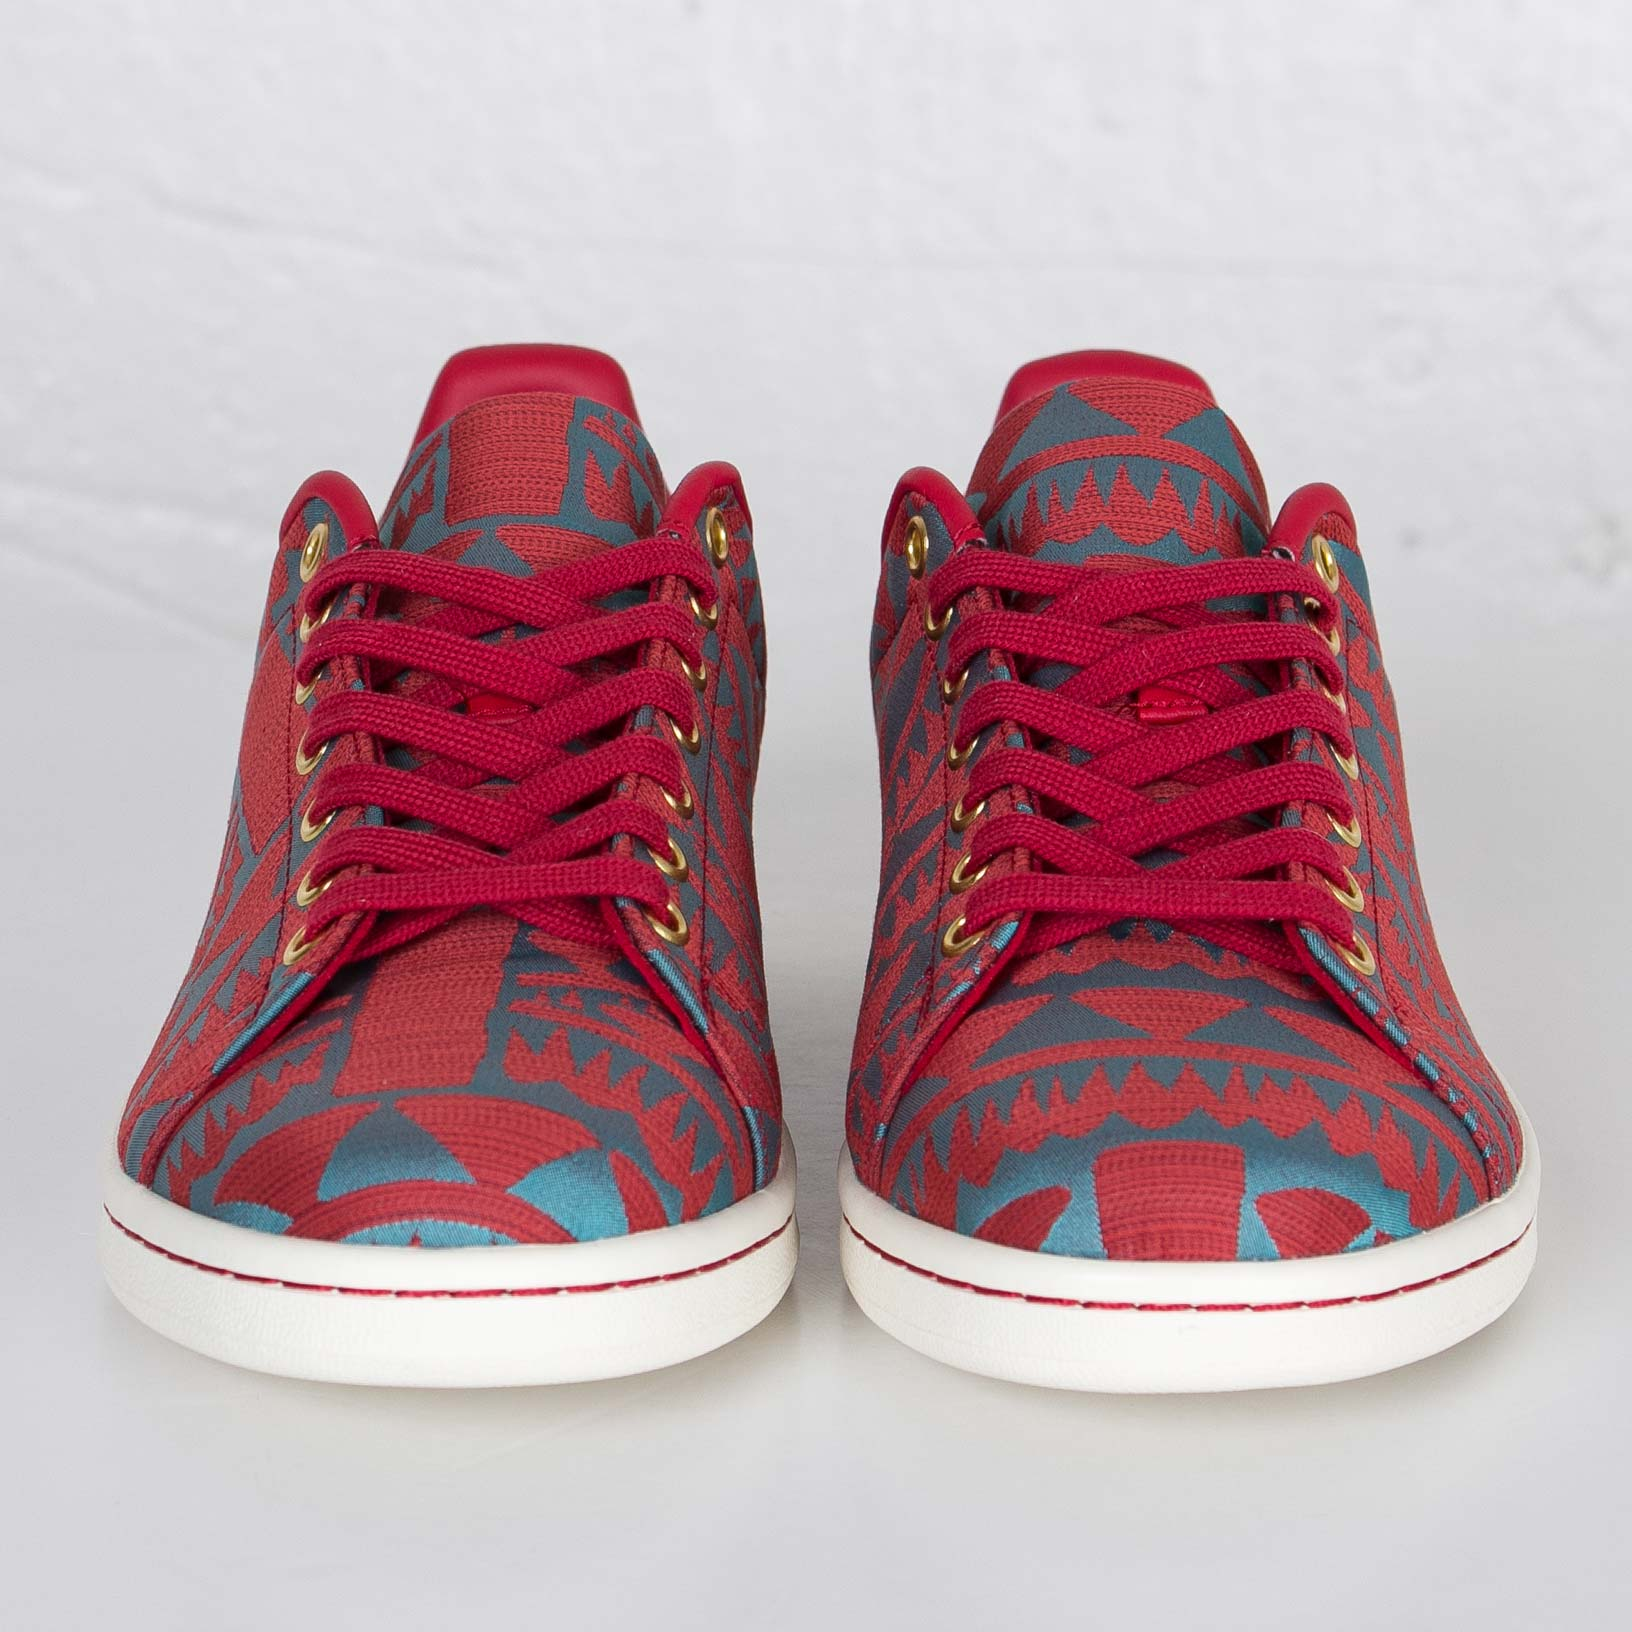 sports shoes cc798 3bbce adidas Stan Smith - S75120 - Sneakersnstuff   sneakers   streetwear online  since 1999